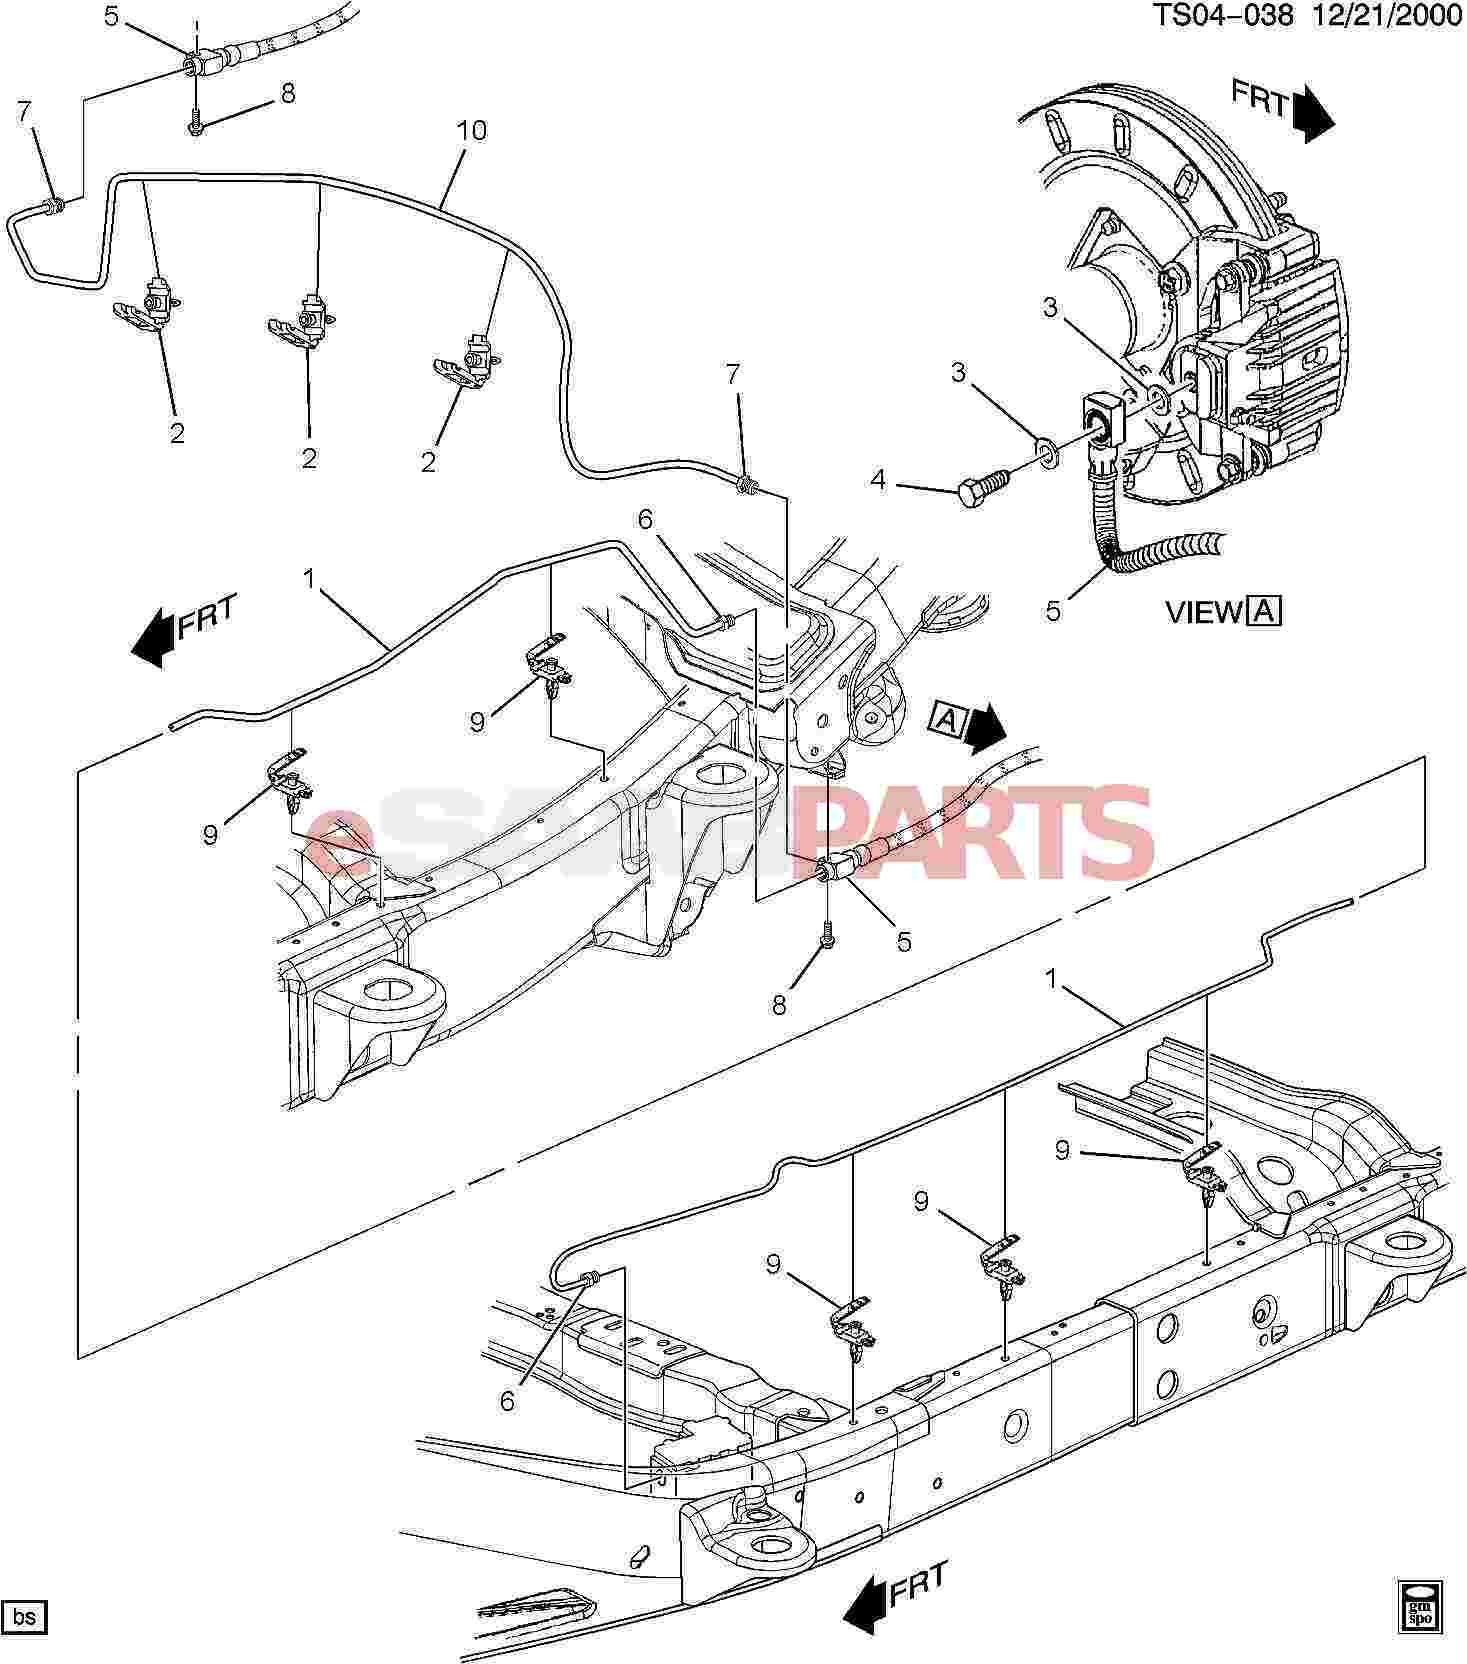 Drum brake assembly diagram esaabparts saab 9 7x brakes parts brake lines brake of drum brake